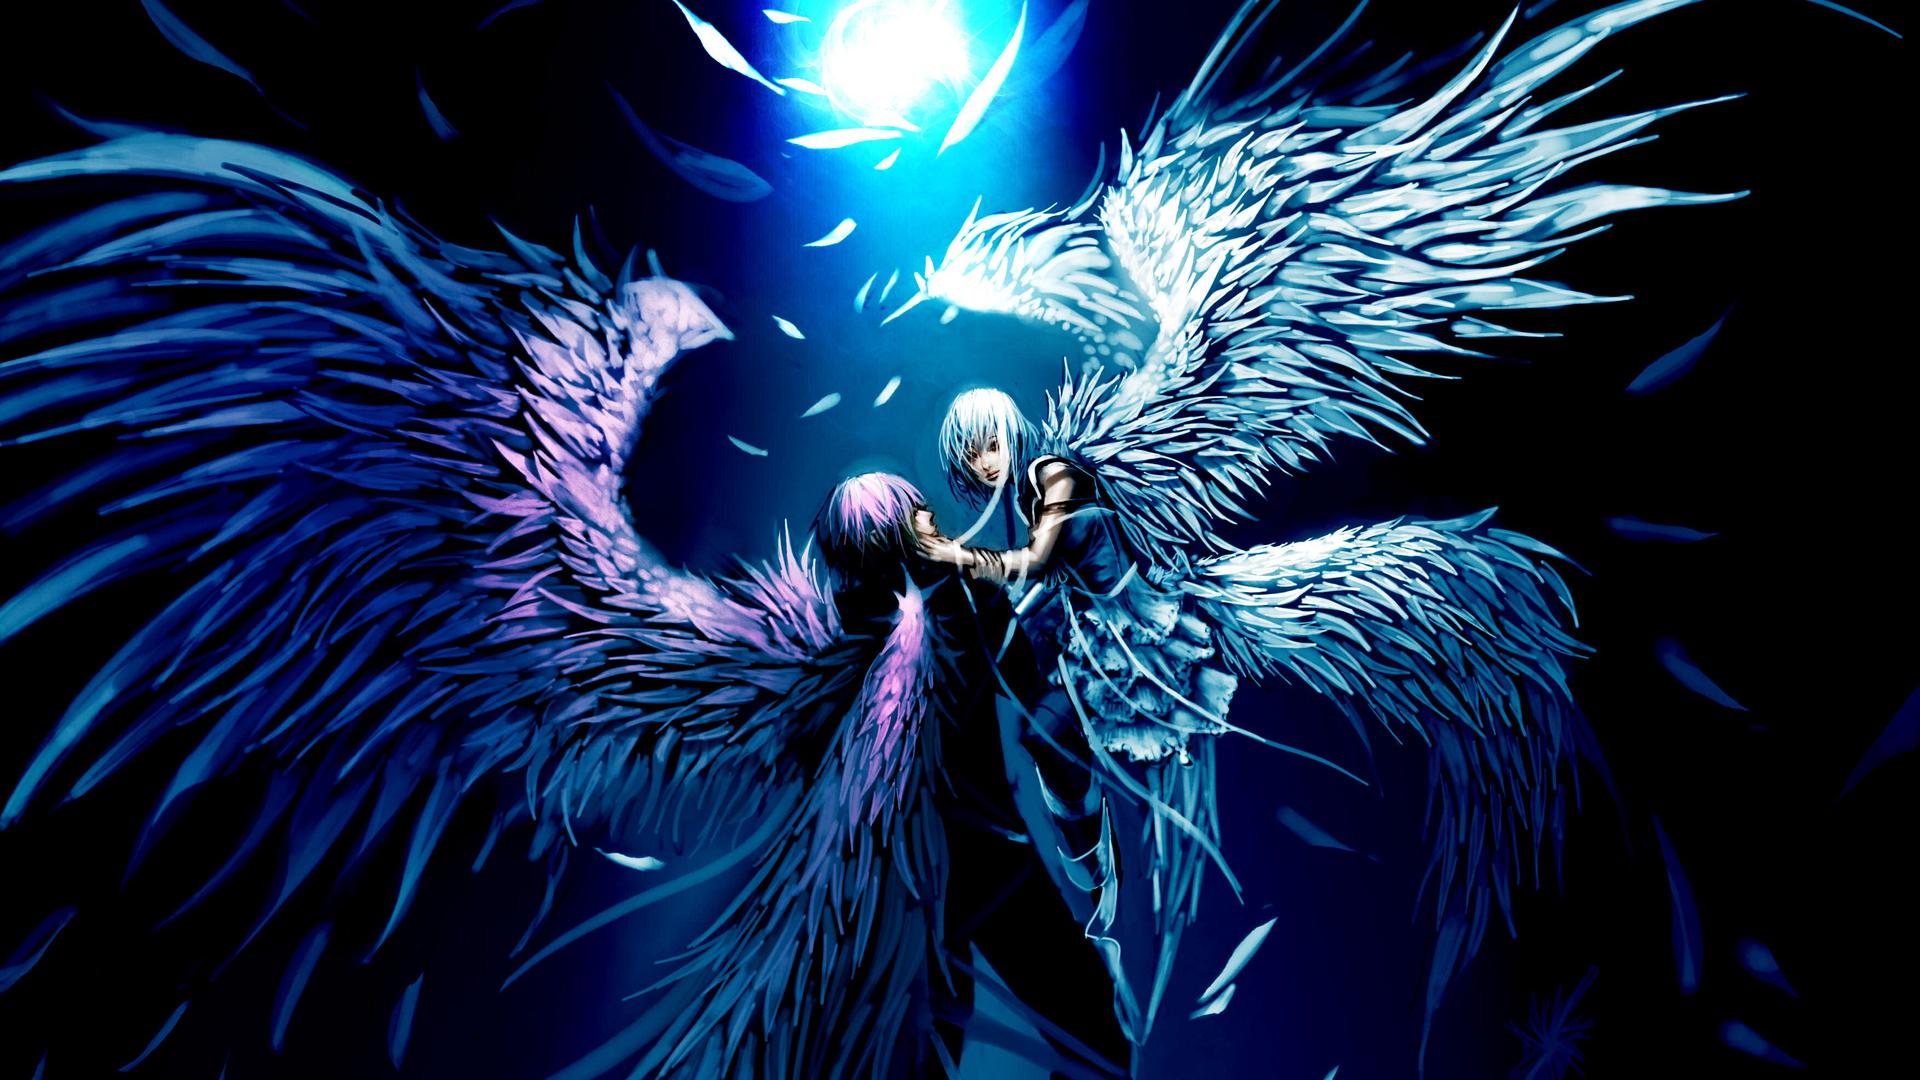 Free Download Full Hd Anime Cupid Angel Full Hd Wallpaper Desktop